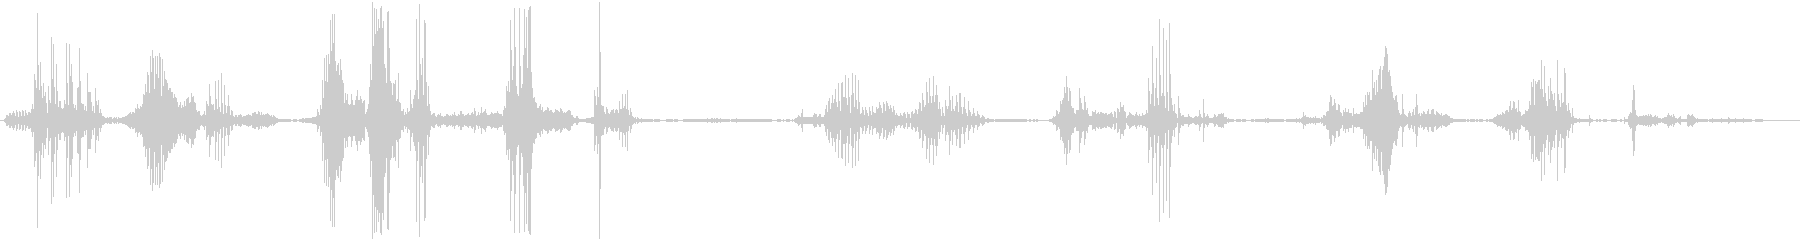 GUTTURAL TALKING ...の未再生の波形